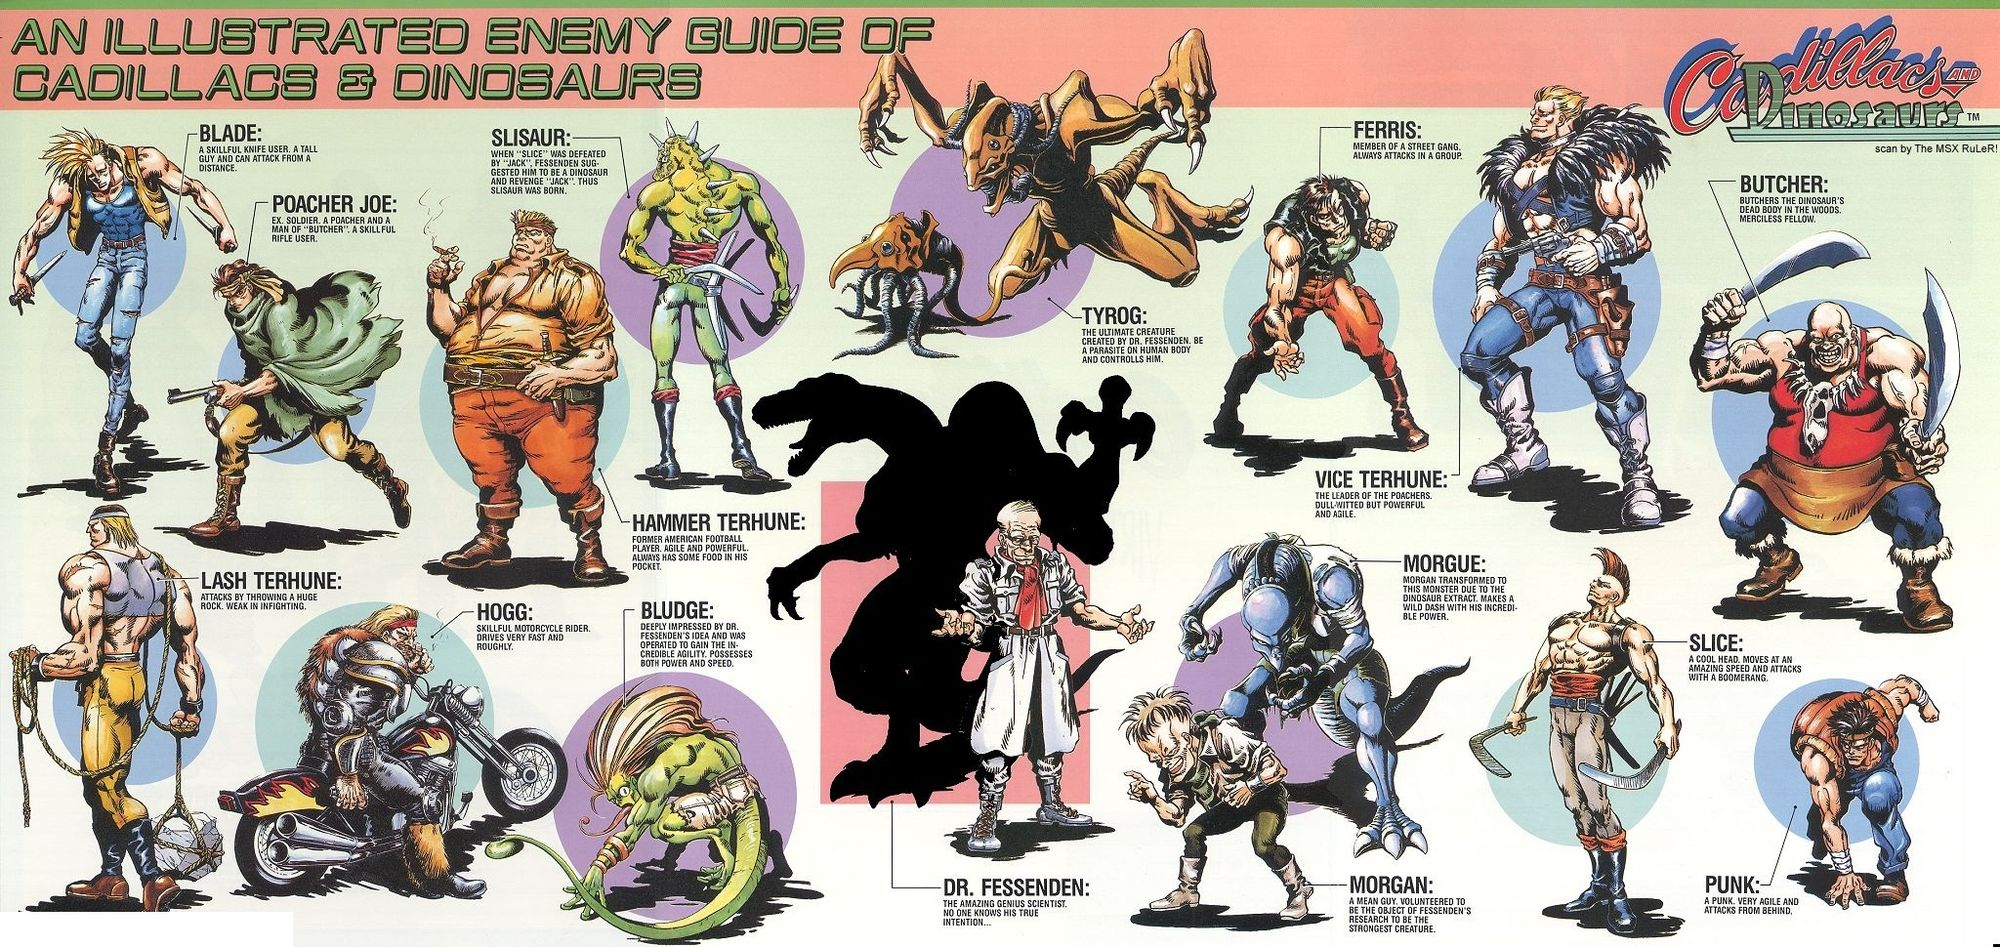 Cadillacs_and_Dinosaurs_(Capcom_1993_Arcade_Game)_-_Enemies_Guide